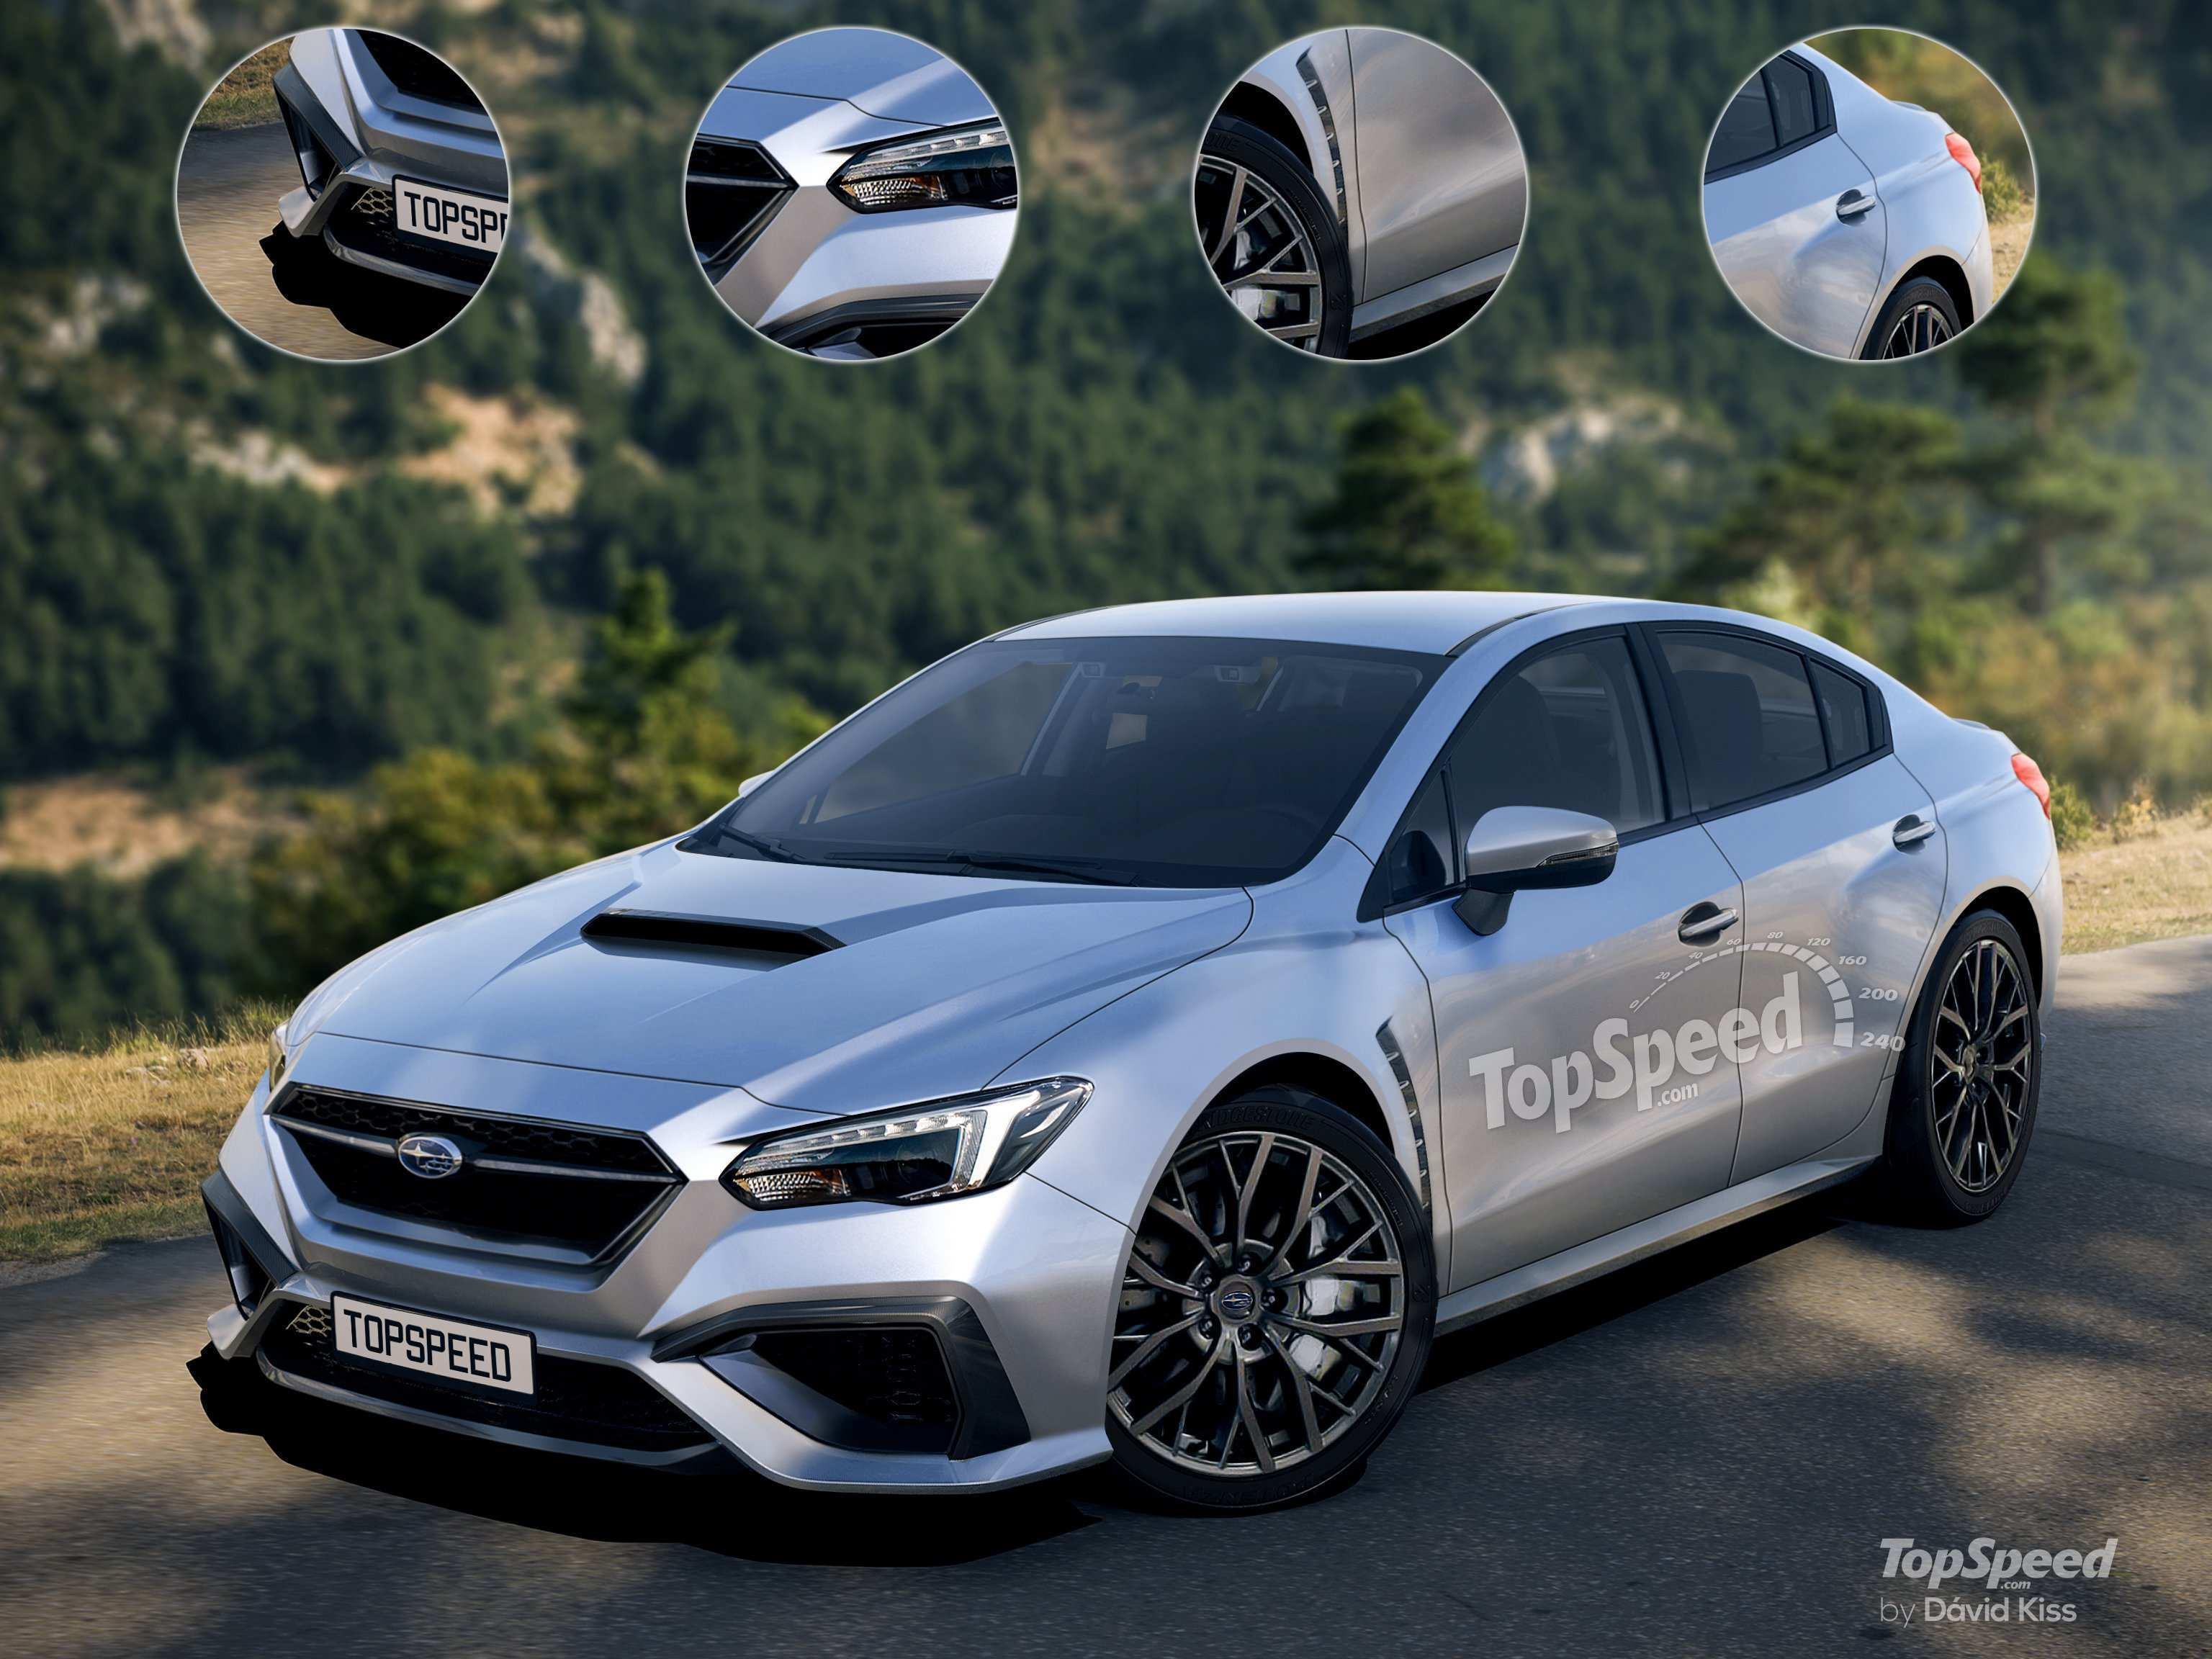 71 All New Subaru 2020 Wrx Rumors for Subaru 2020 Wrx